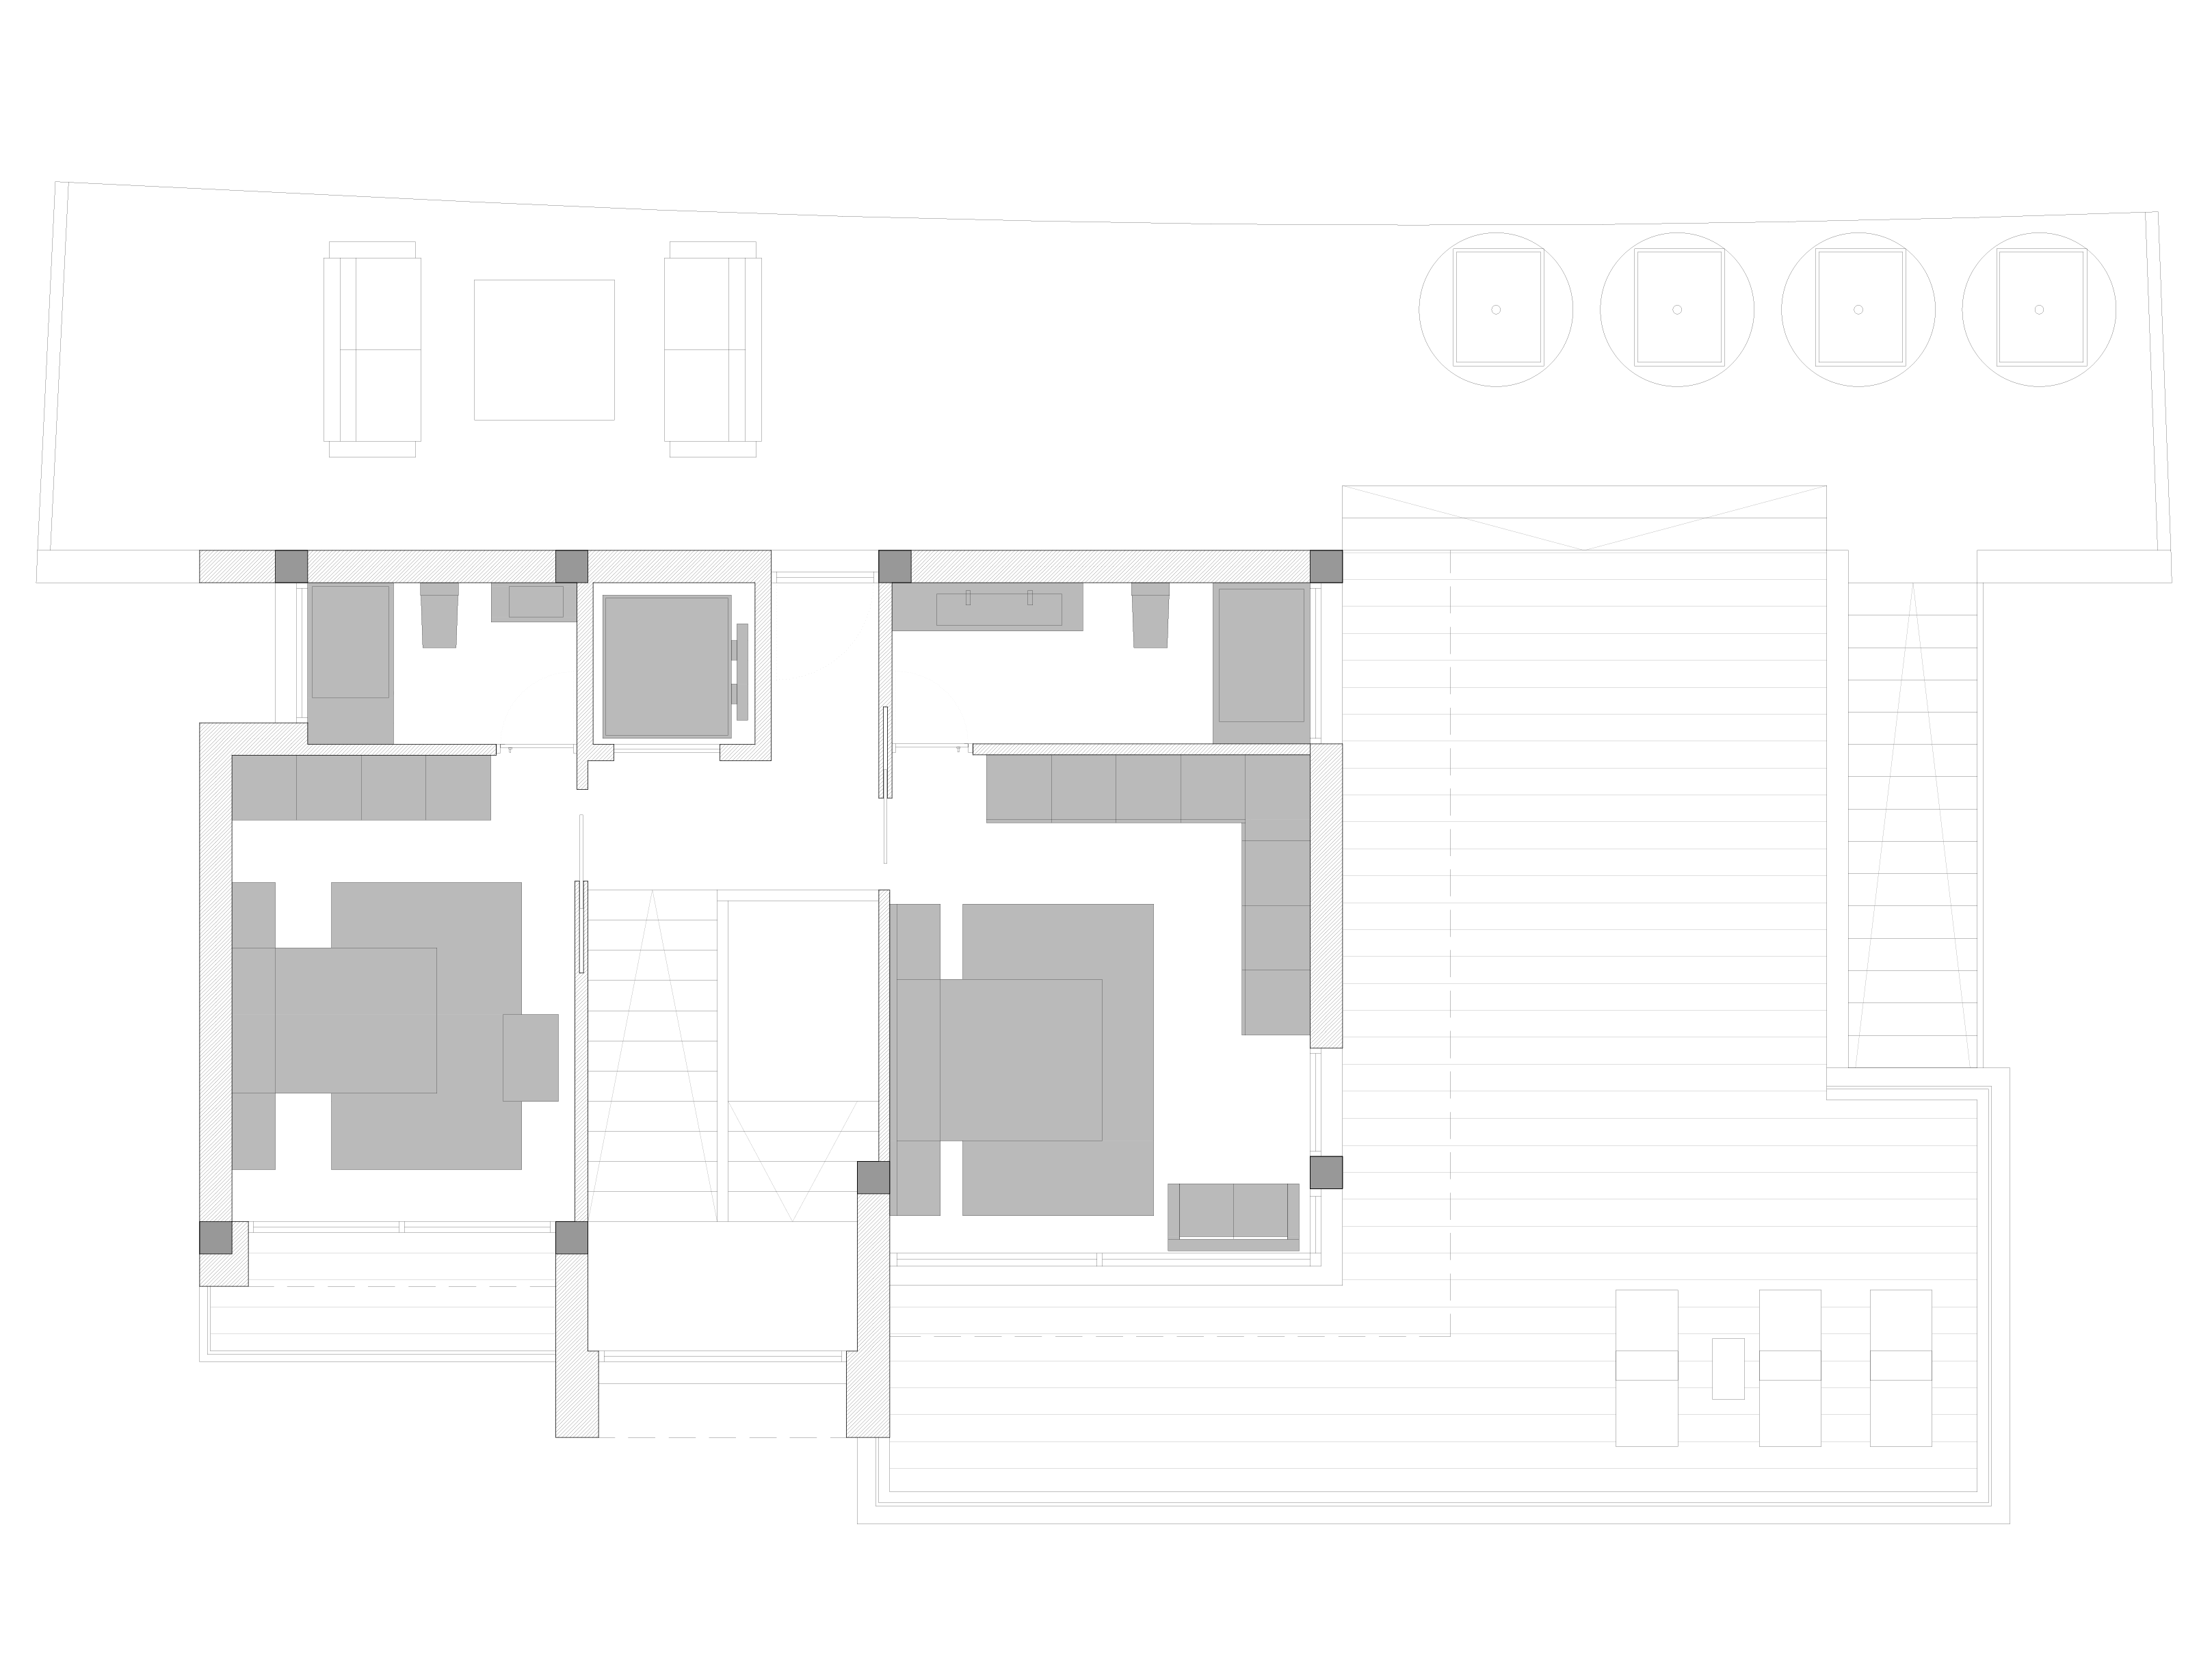 planta-primera-def-03-06-min